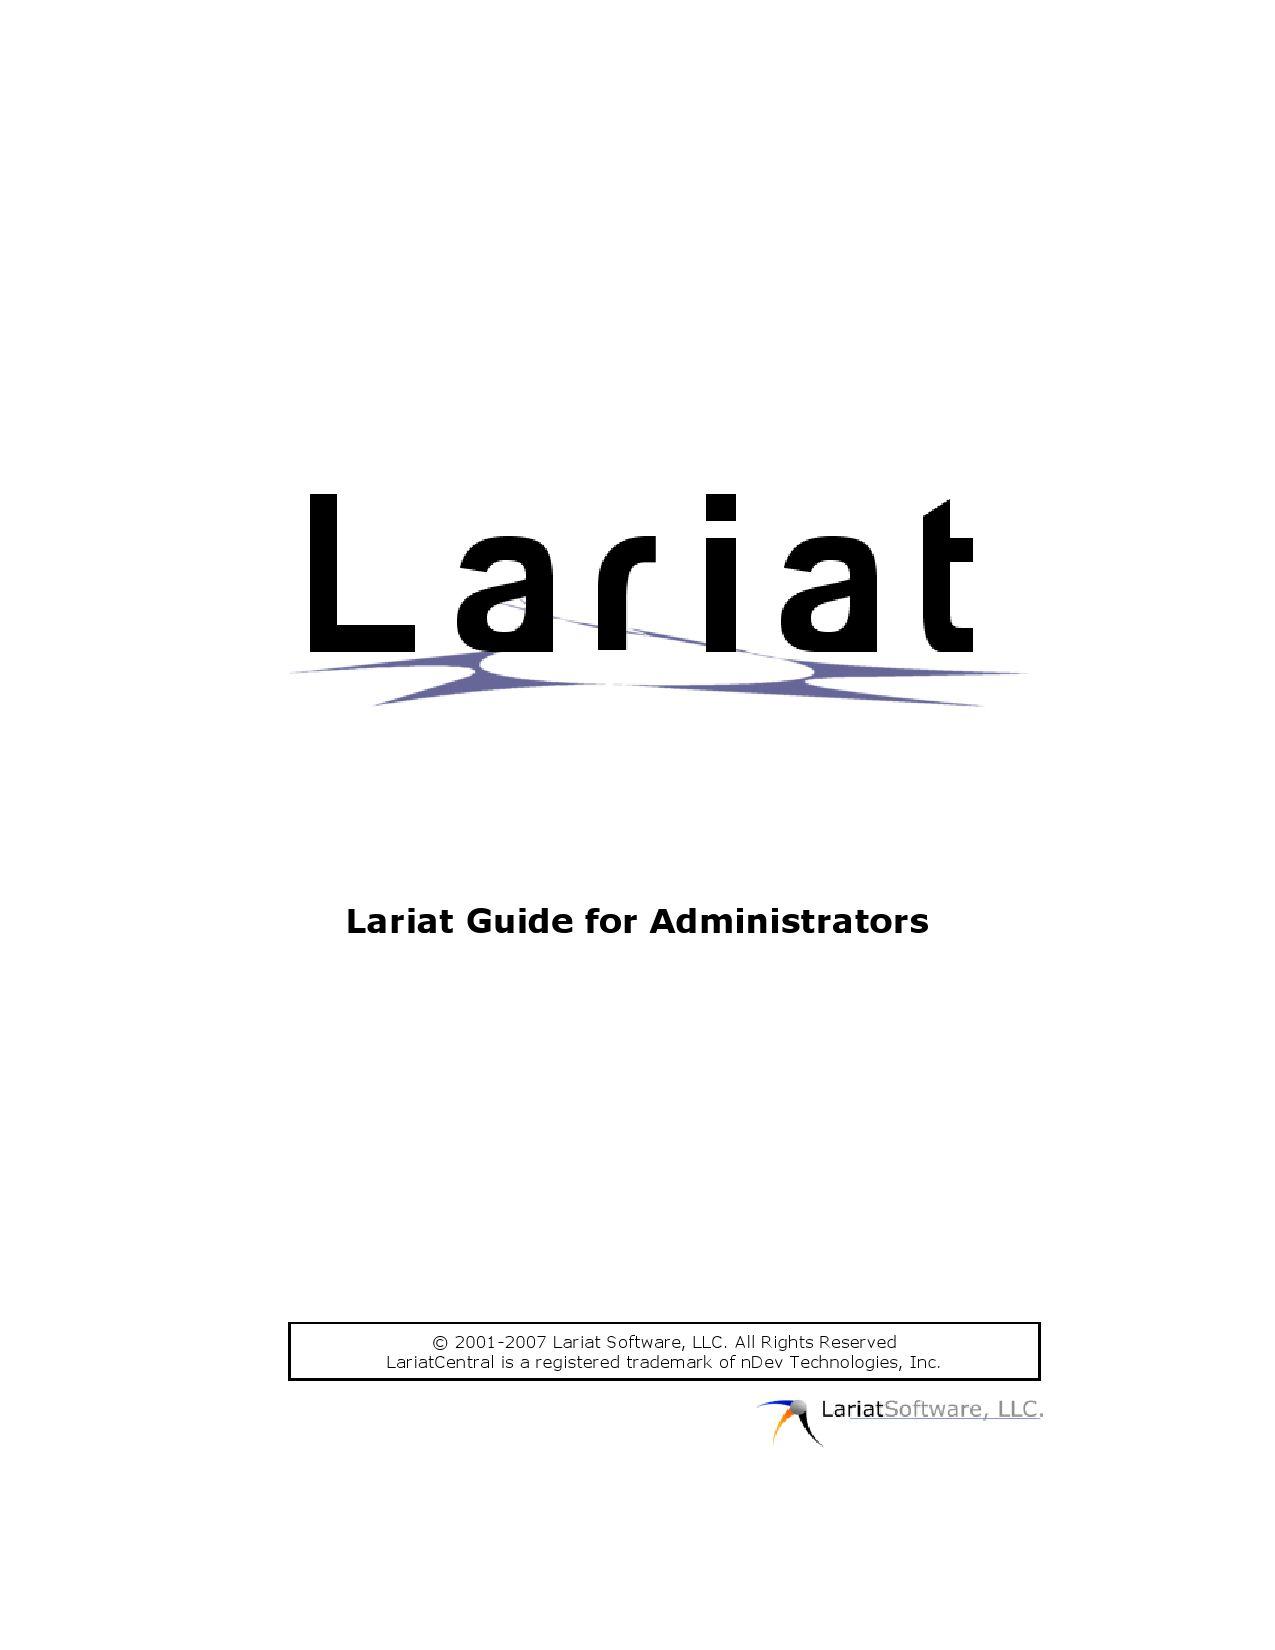 Lariat administrator guide by lariatsoftware issuu buycottarizona Images